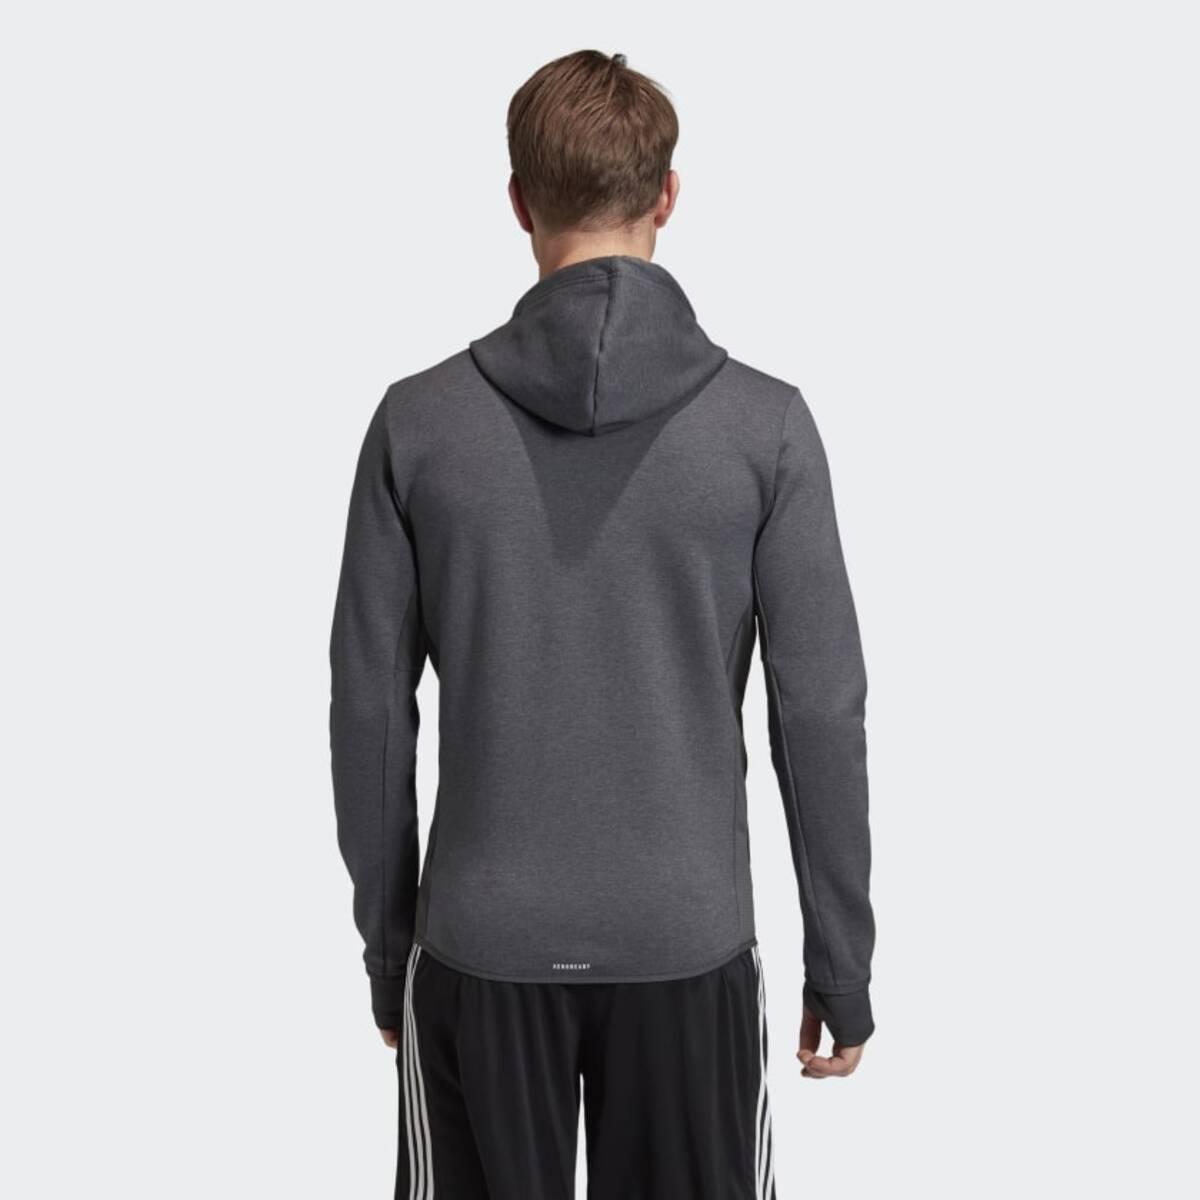 Designed to Move Motion Erkek Kapüşonlu Gri Spor Üst